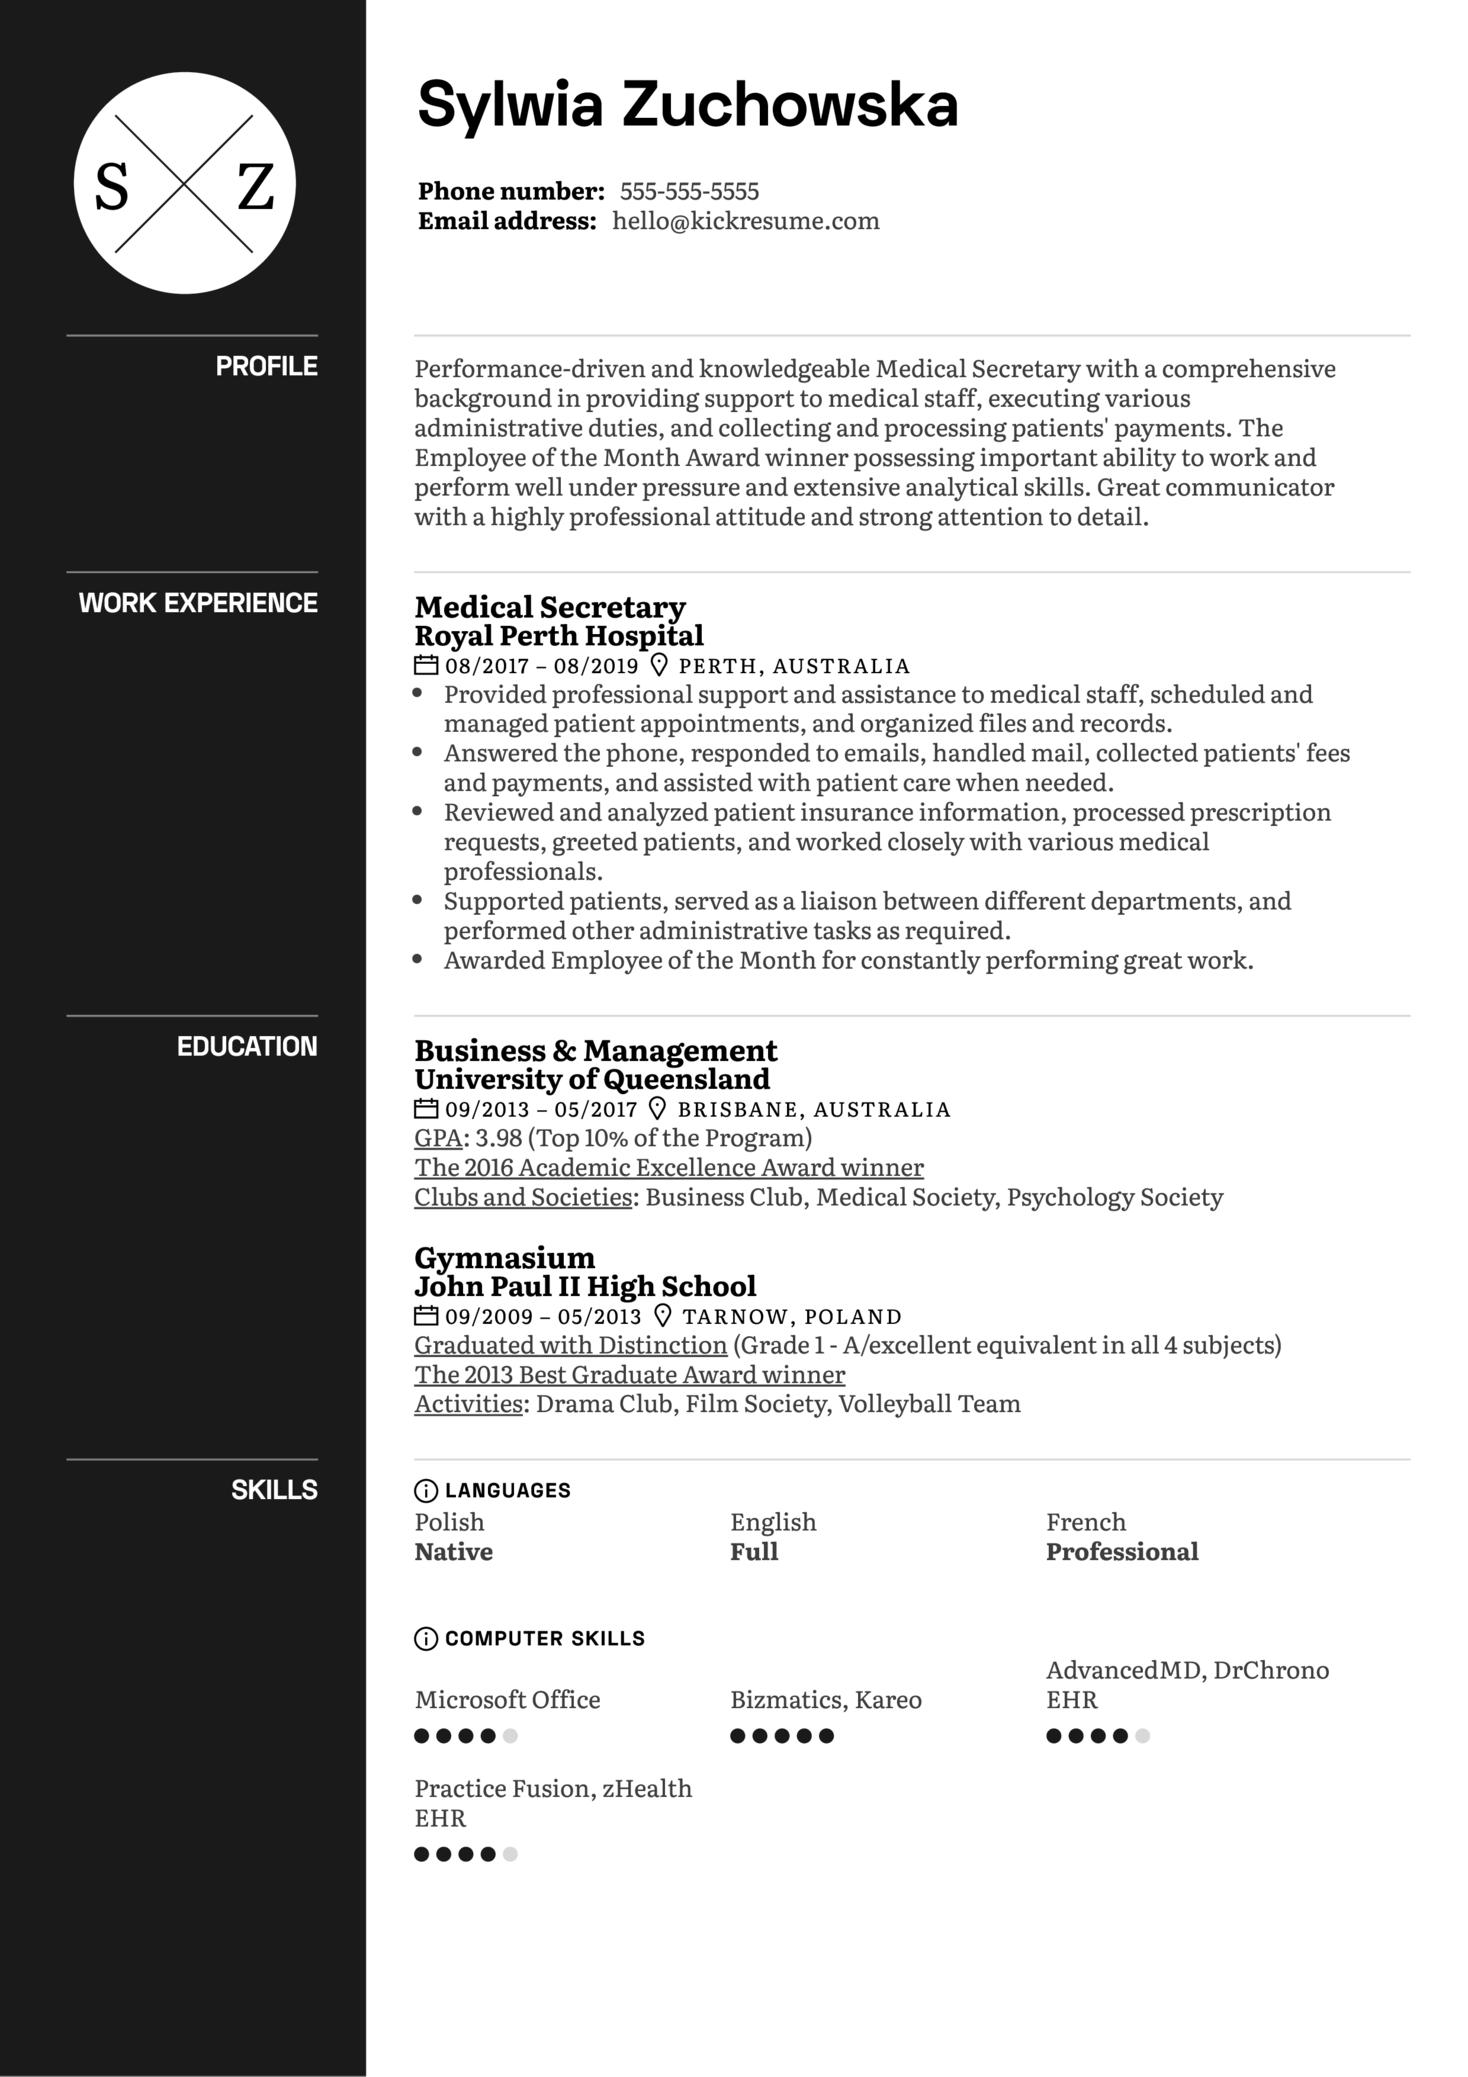 Medical Secretary Resume Example (Part 1)